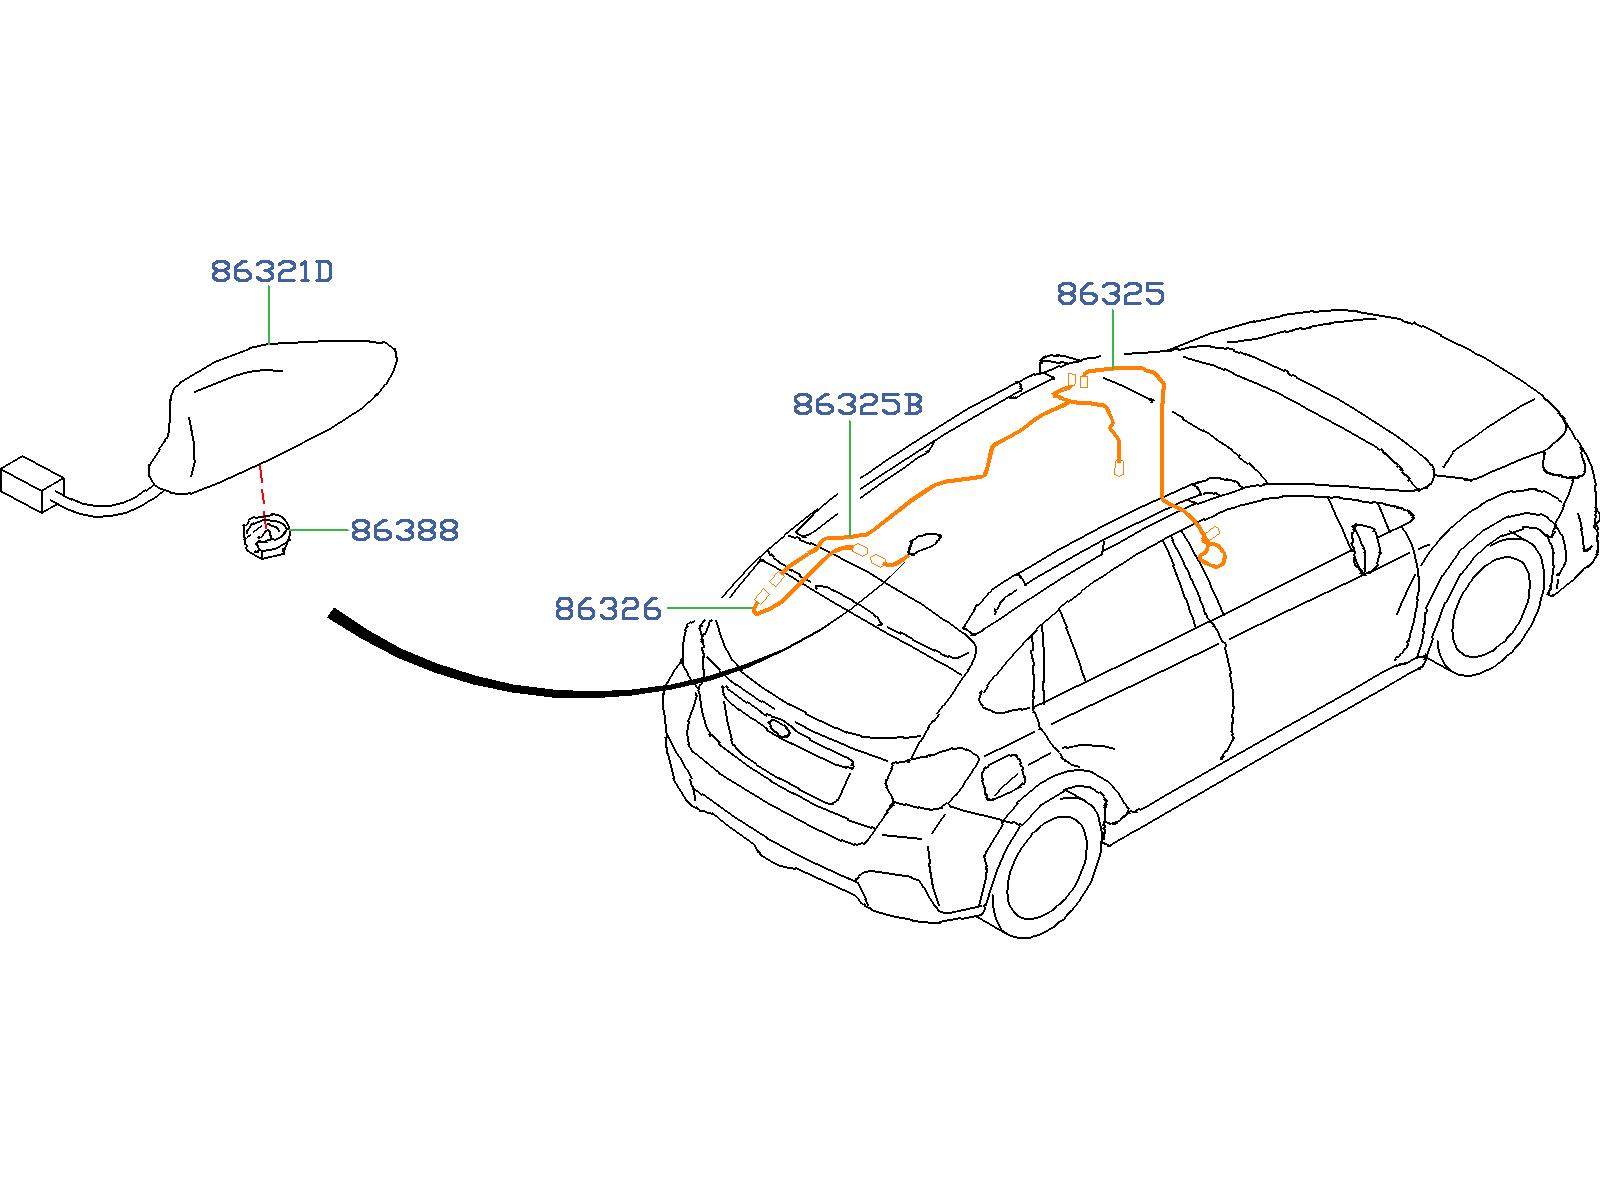 Subaru Crosstrek Antenna Assembly D